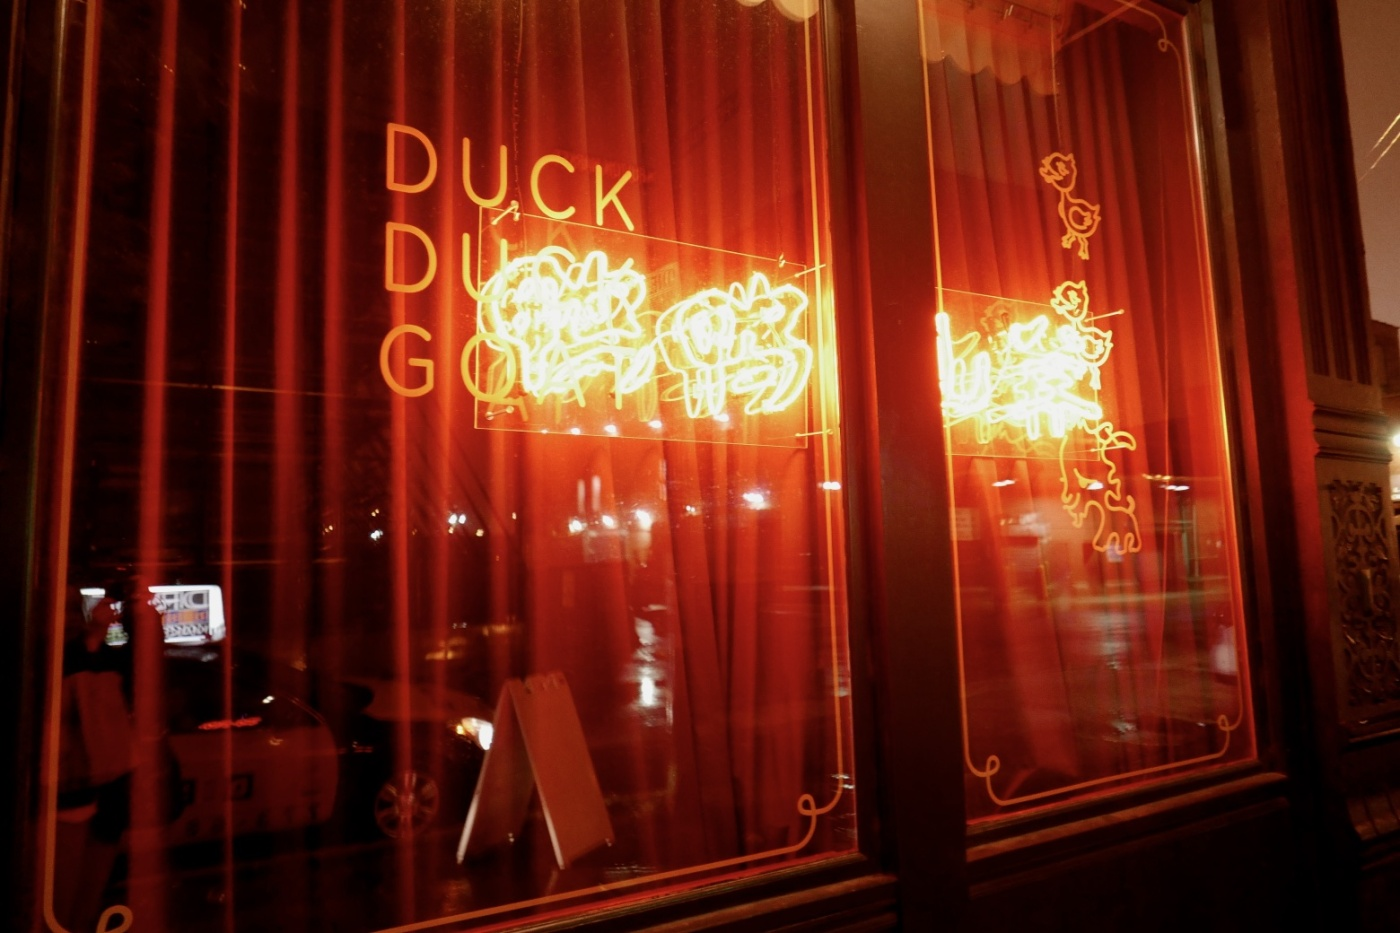 Duck Duck Goat, 857 W Fulton Market, Chicago, IL